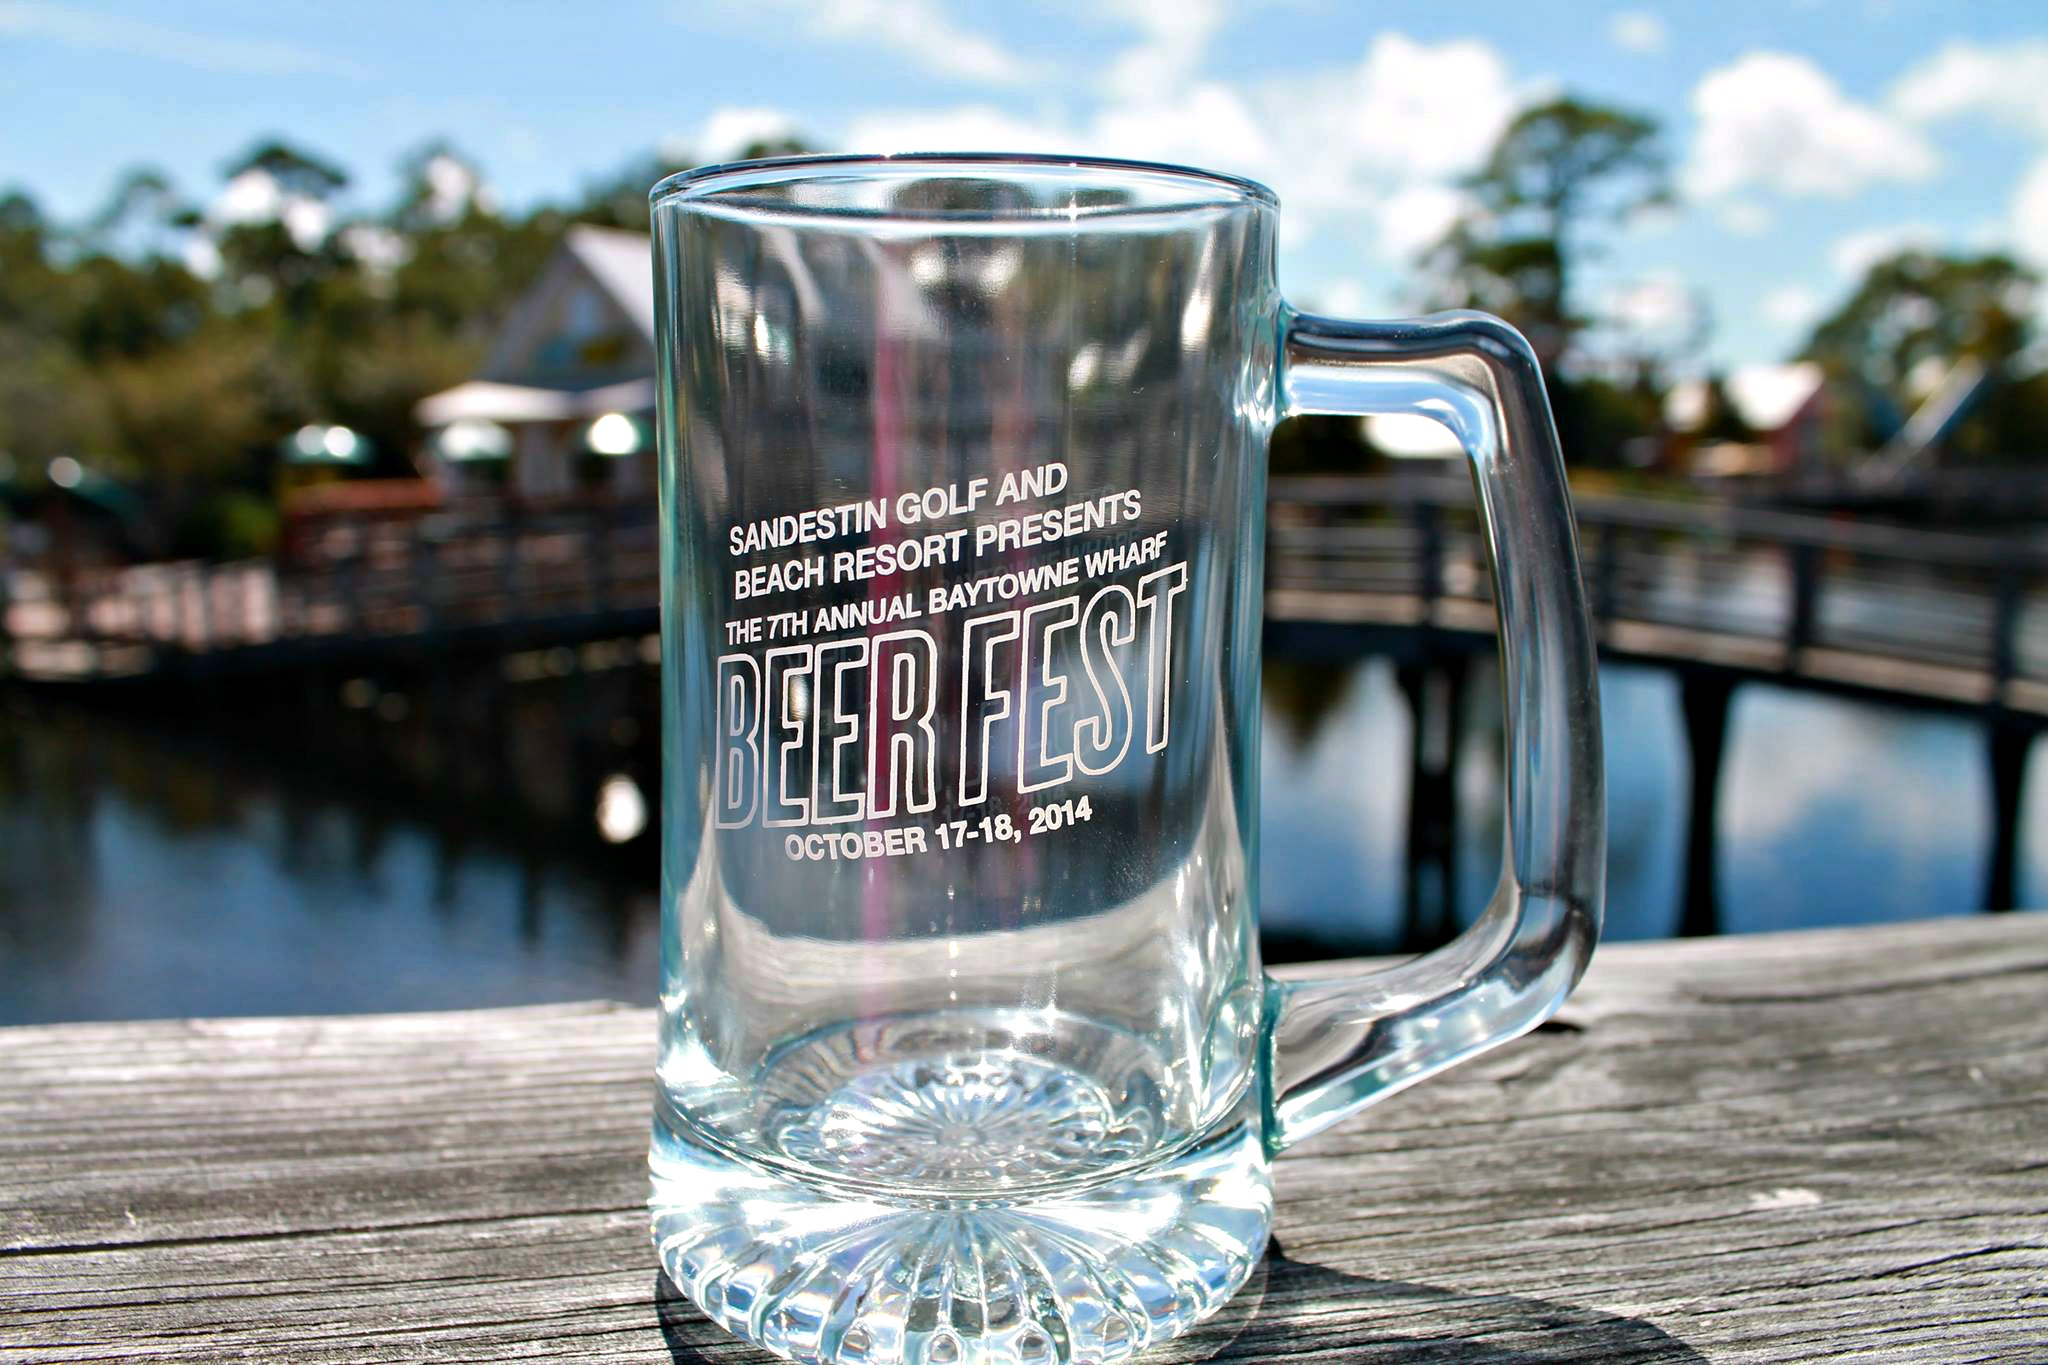 baytowne wharf beer fest mug